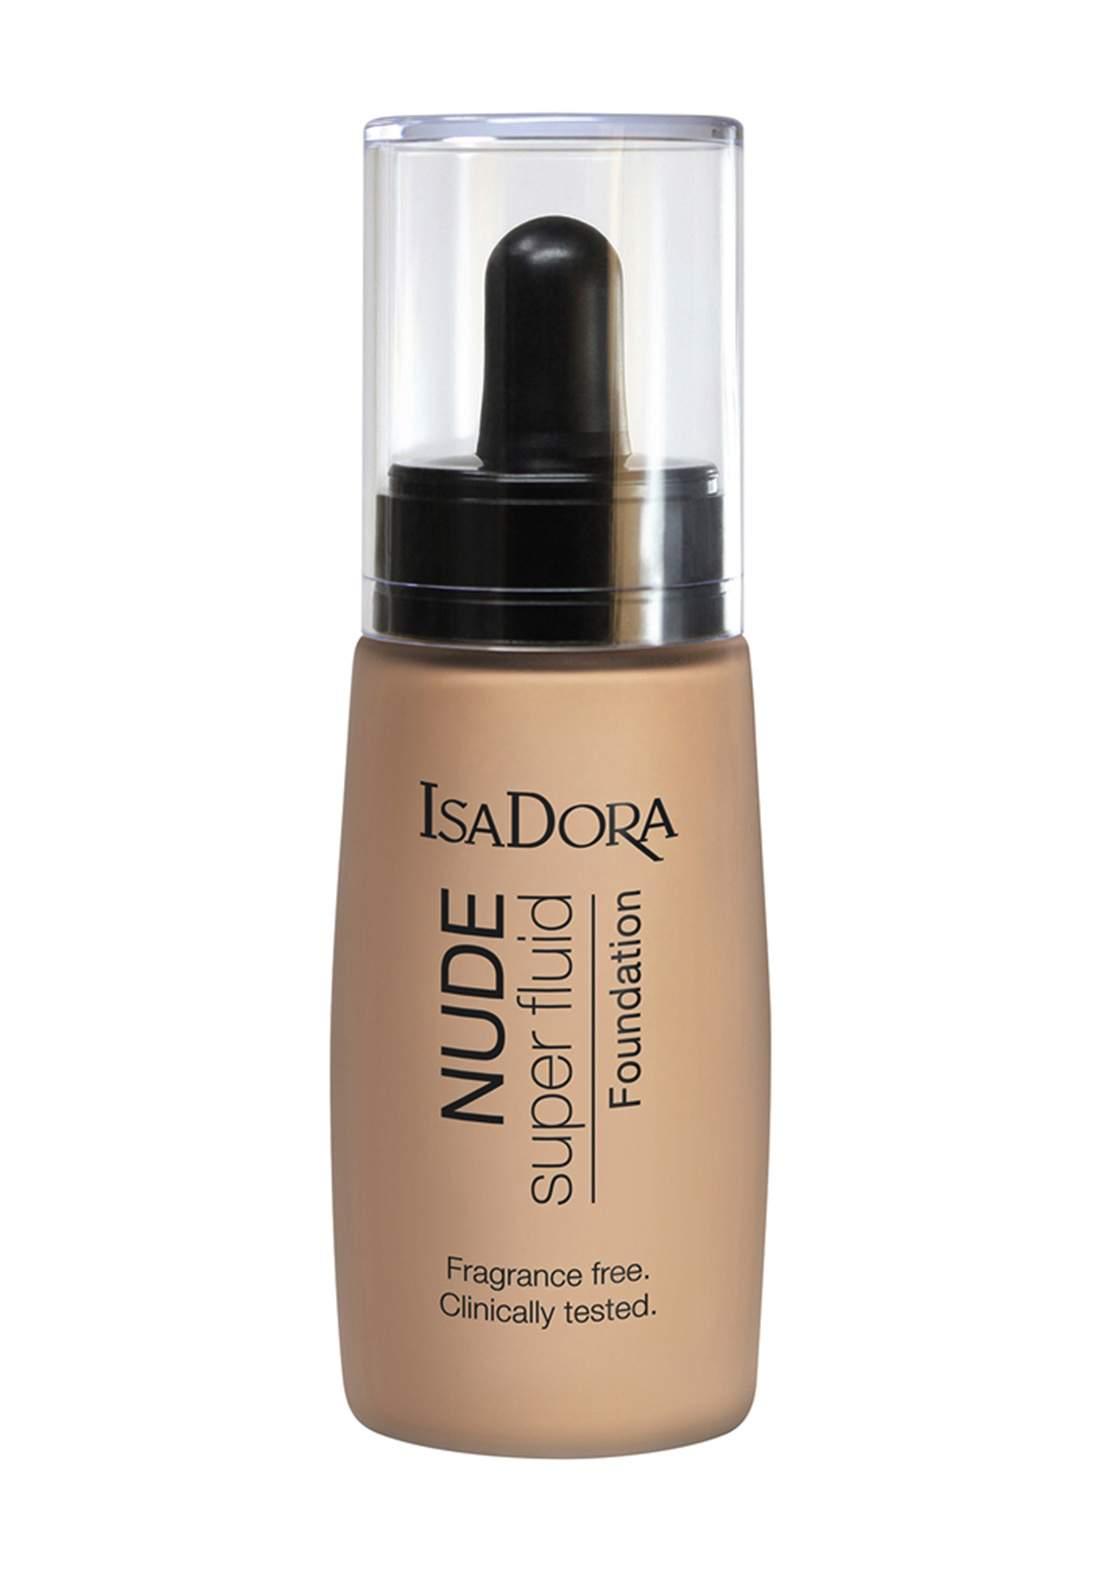 IsaDora 314295 Nude Super Fluid Foundation - Nude Beige 30 ML كريم اساس